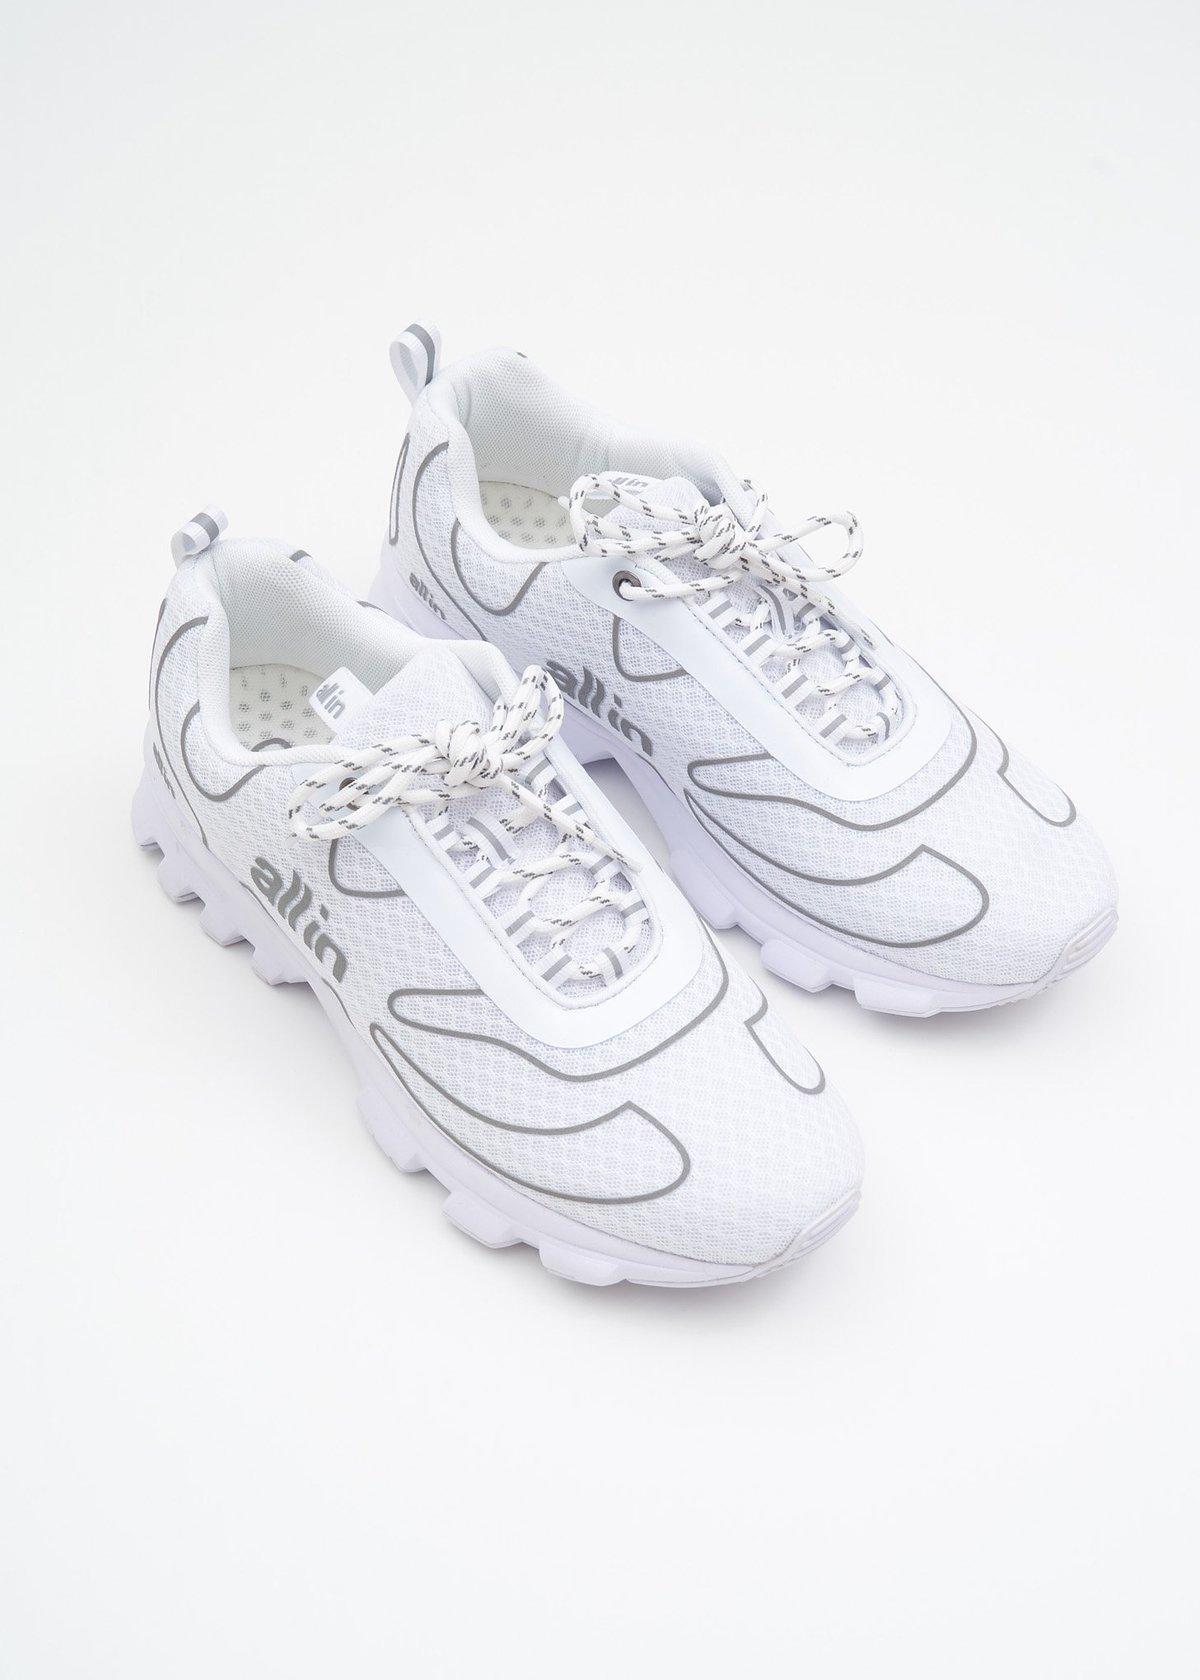 White-Reflective-Tennis-Shoes-20180818043731.jpg?1534567053